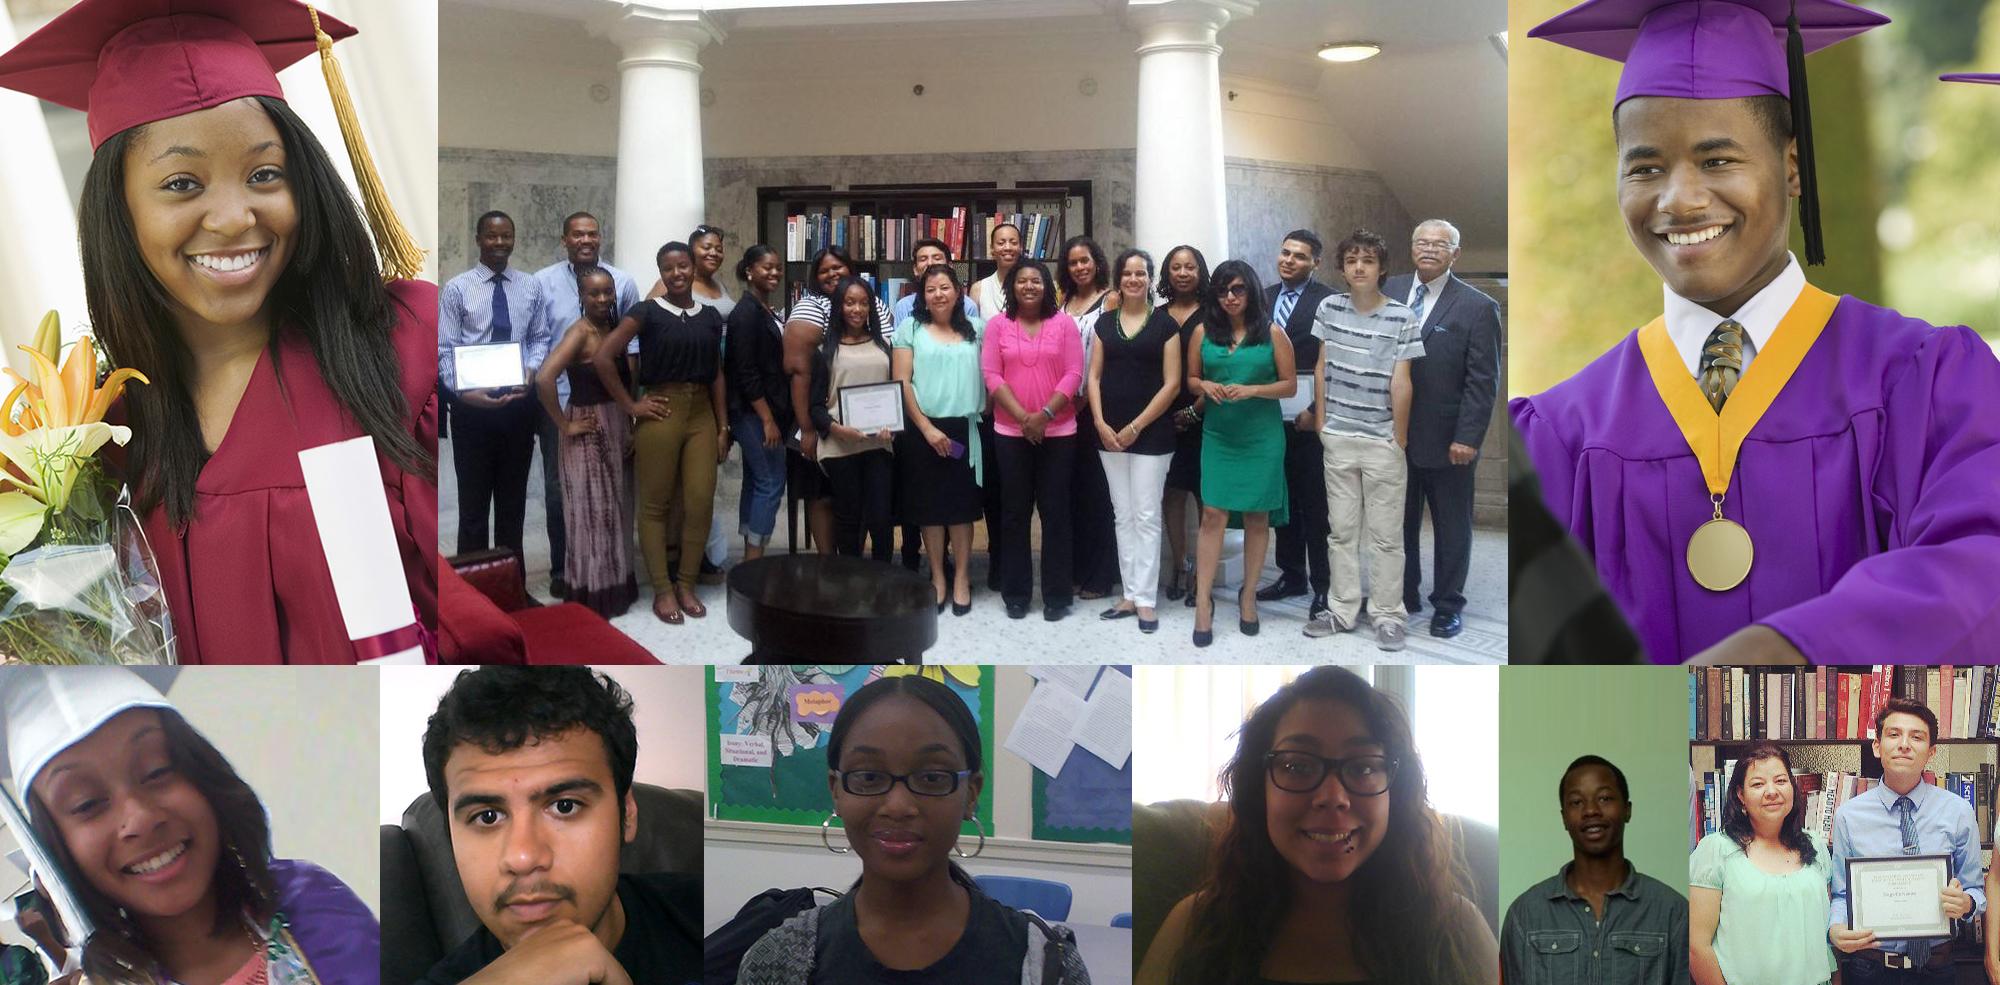 BSLA-Slider-2_-Scholarships-Photo